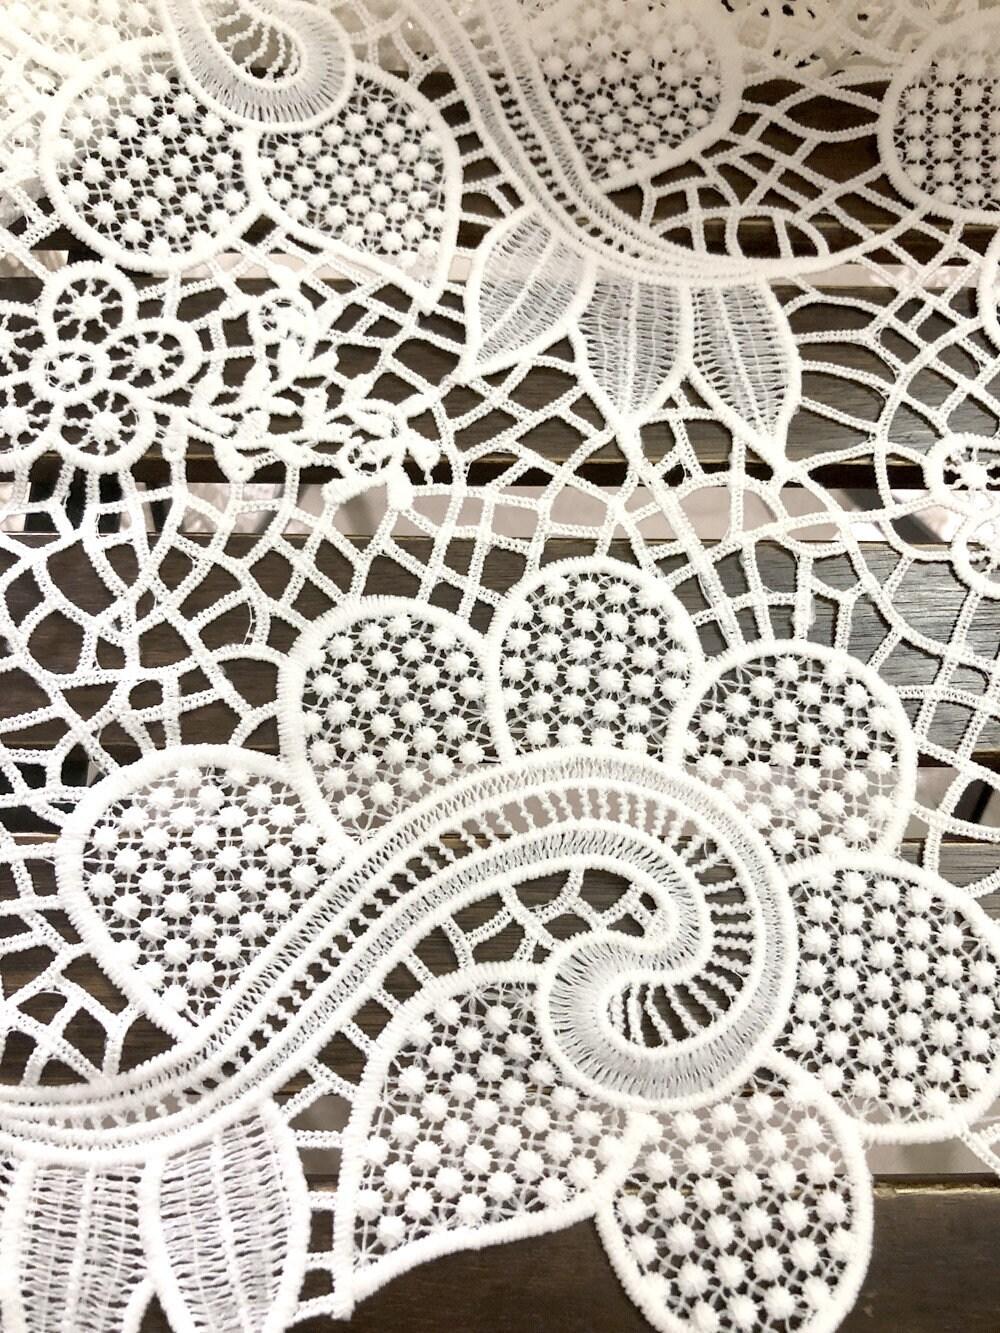 Tissu de dentelle guipure, broderie élégante broderie guipure, de fleur de Guipure, dentelle chimique 39ff3b